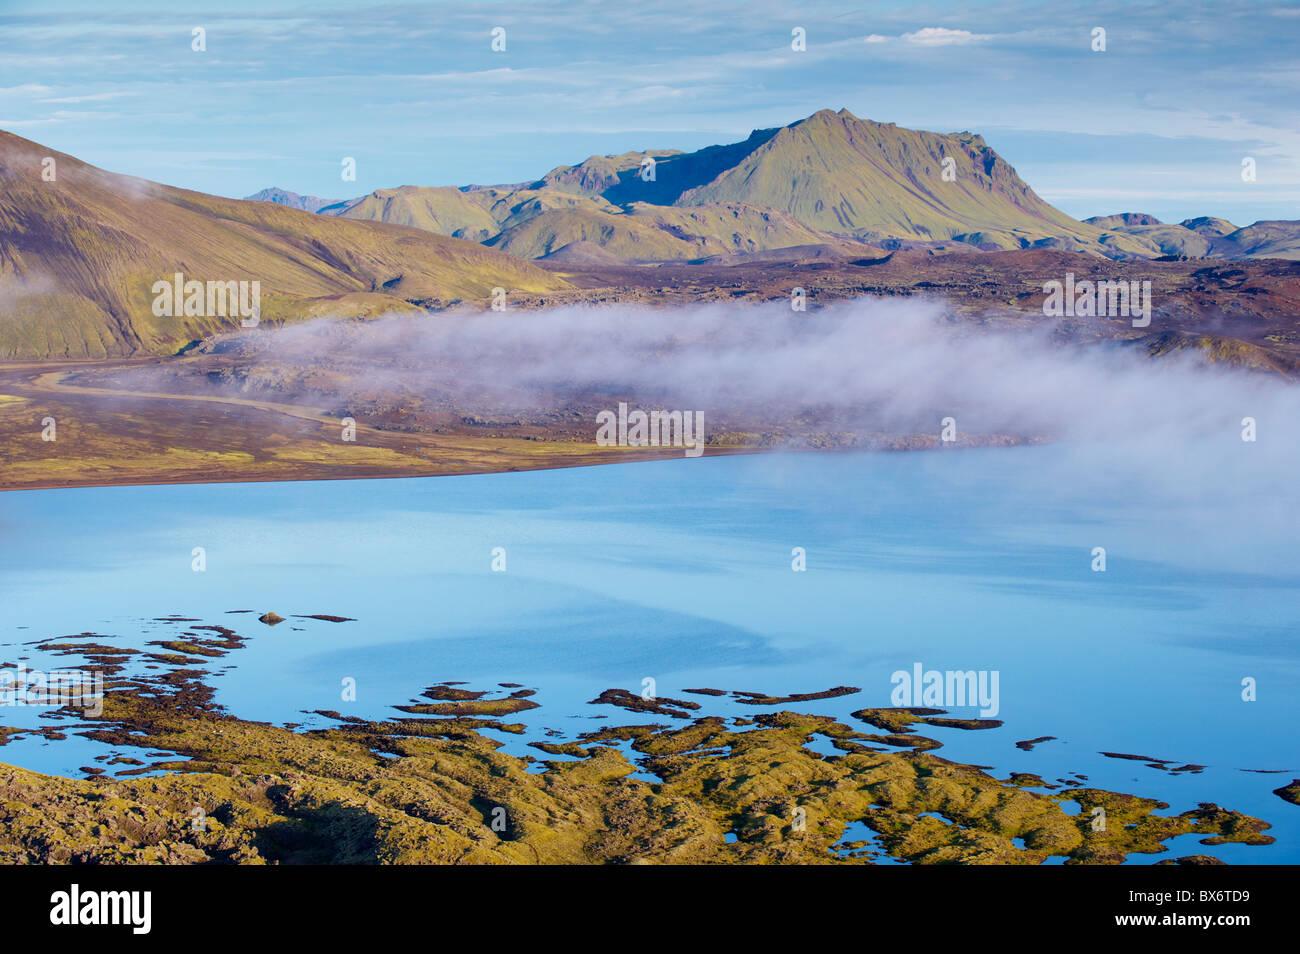 Lava flows in lake Frostadavatn, Landmannalaugar area, Fjallabak region, Iceland, Polar Regions - Stock Image